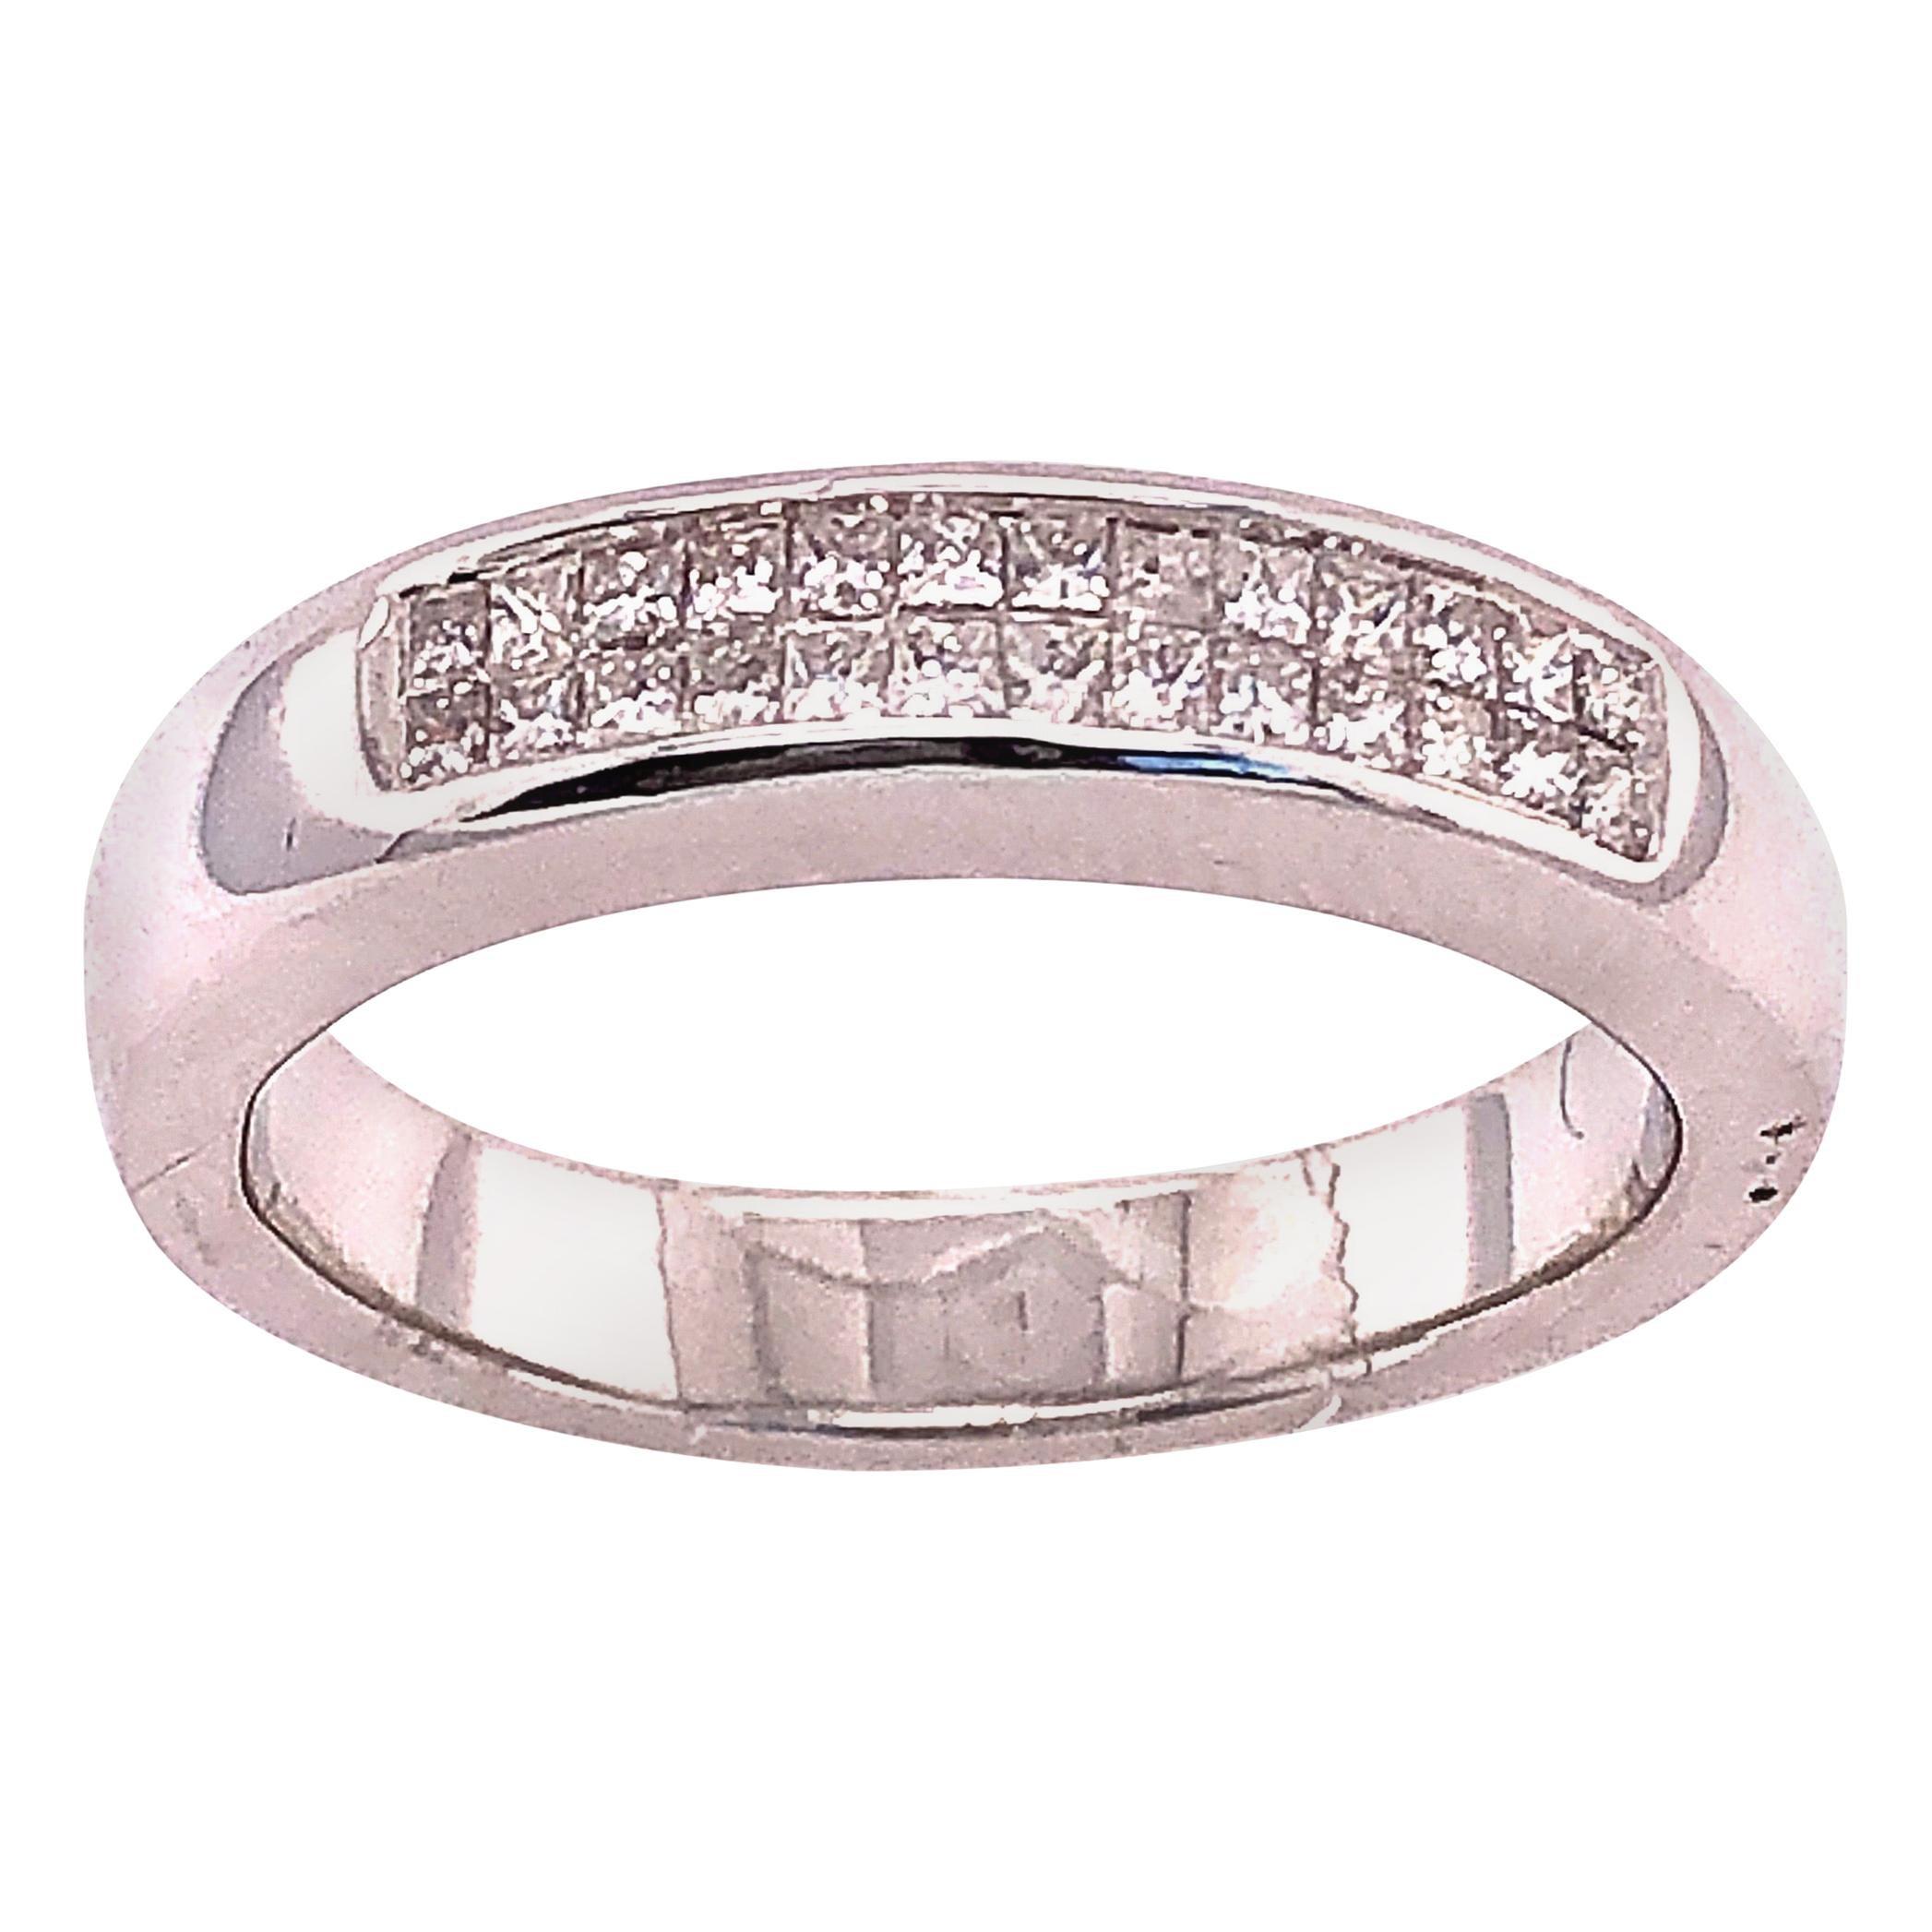 14 Karat White Gold Fashion Ring with Diamonds